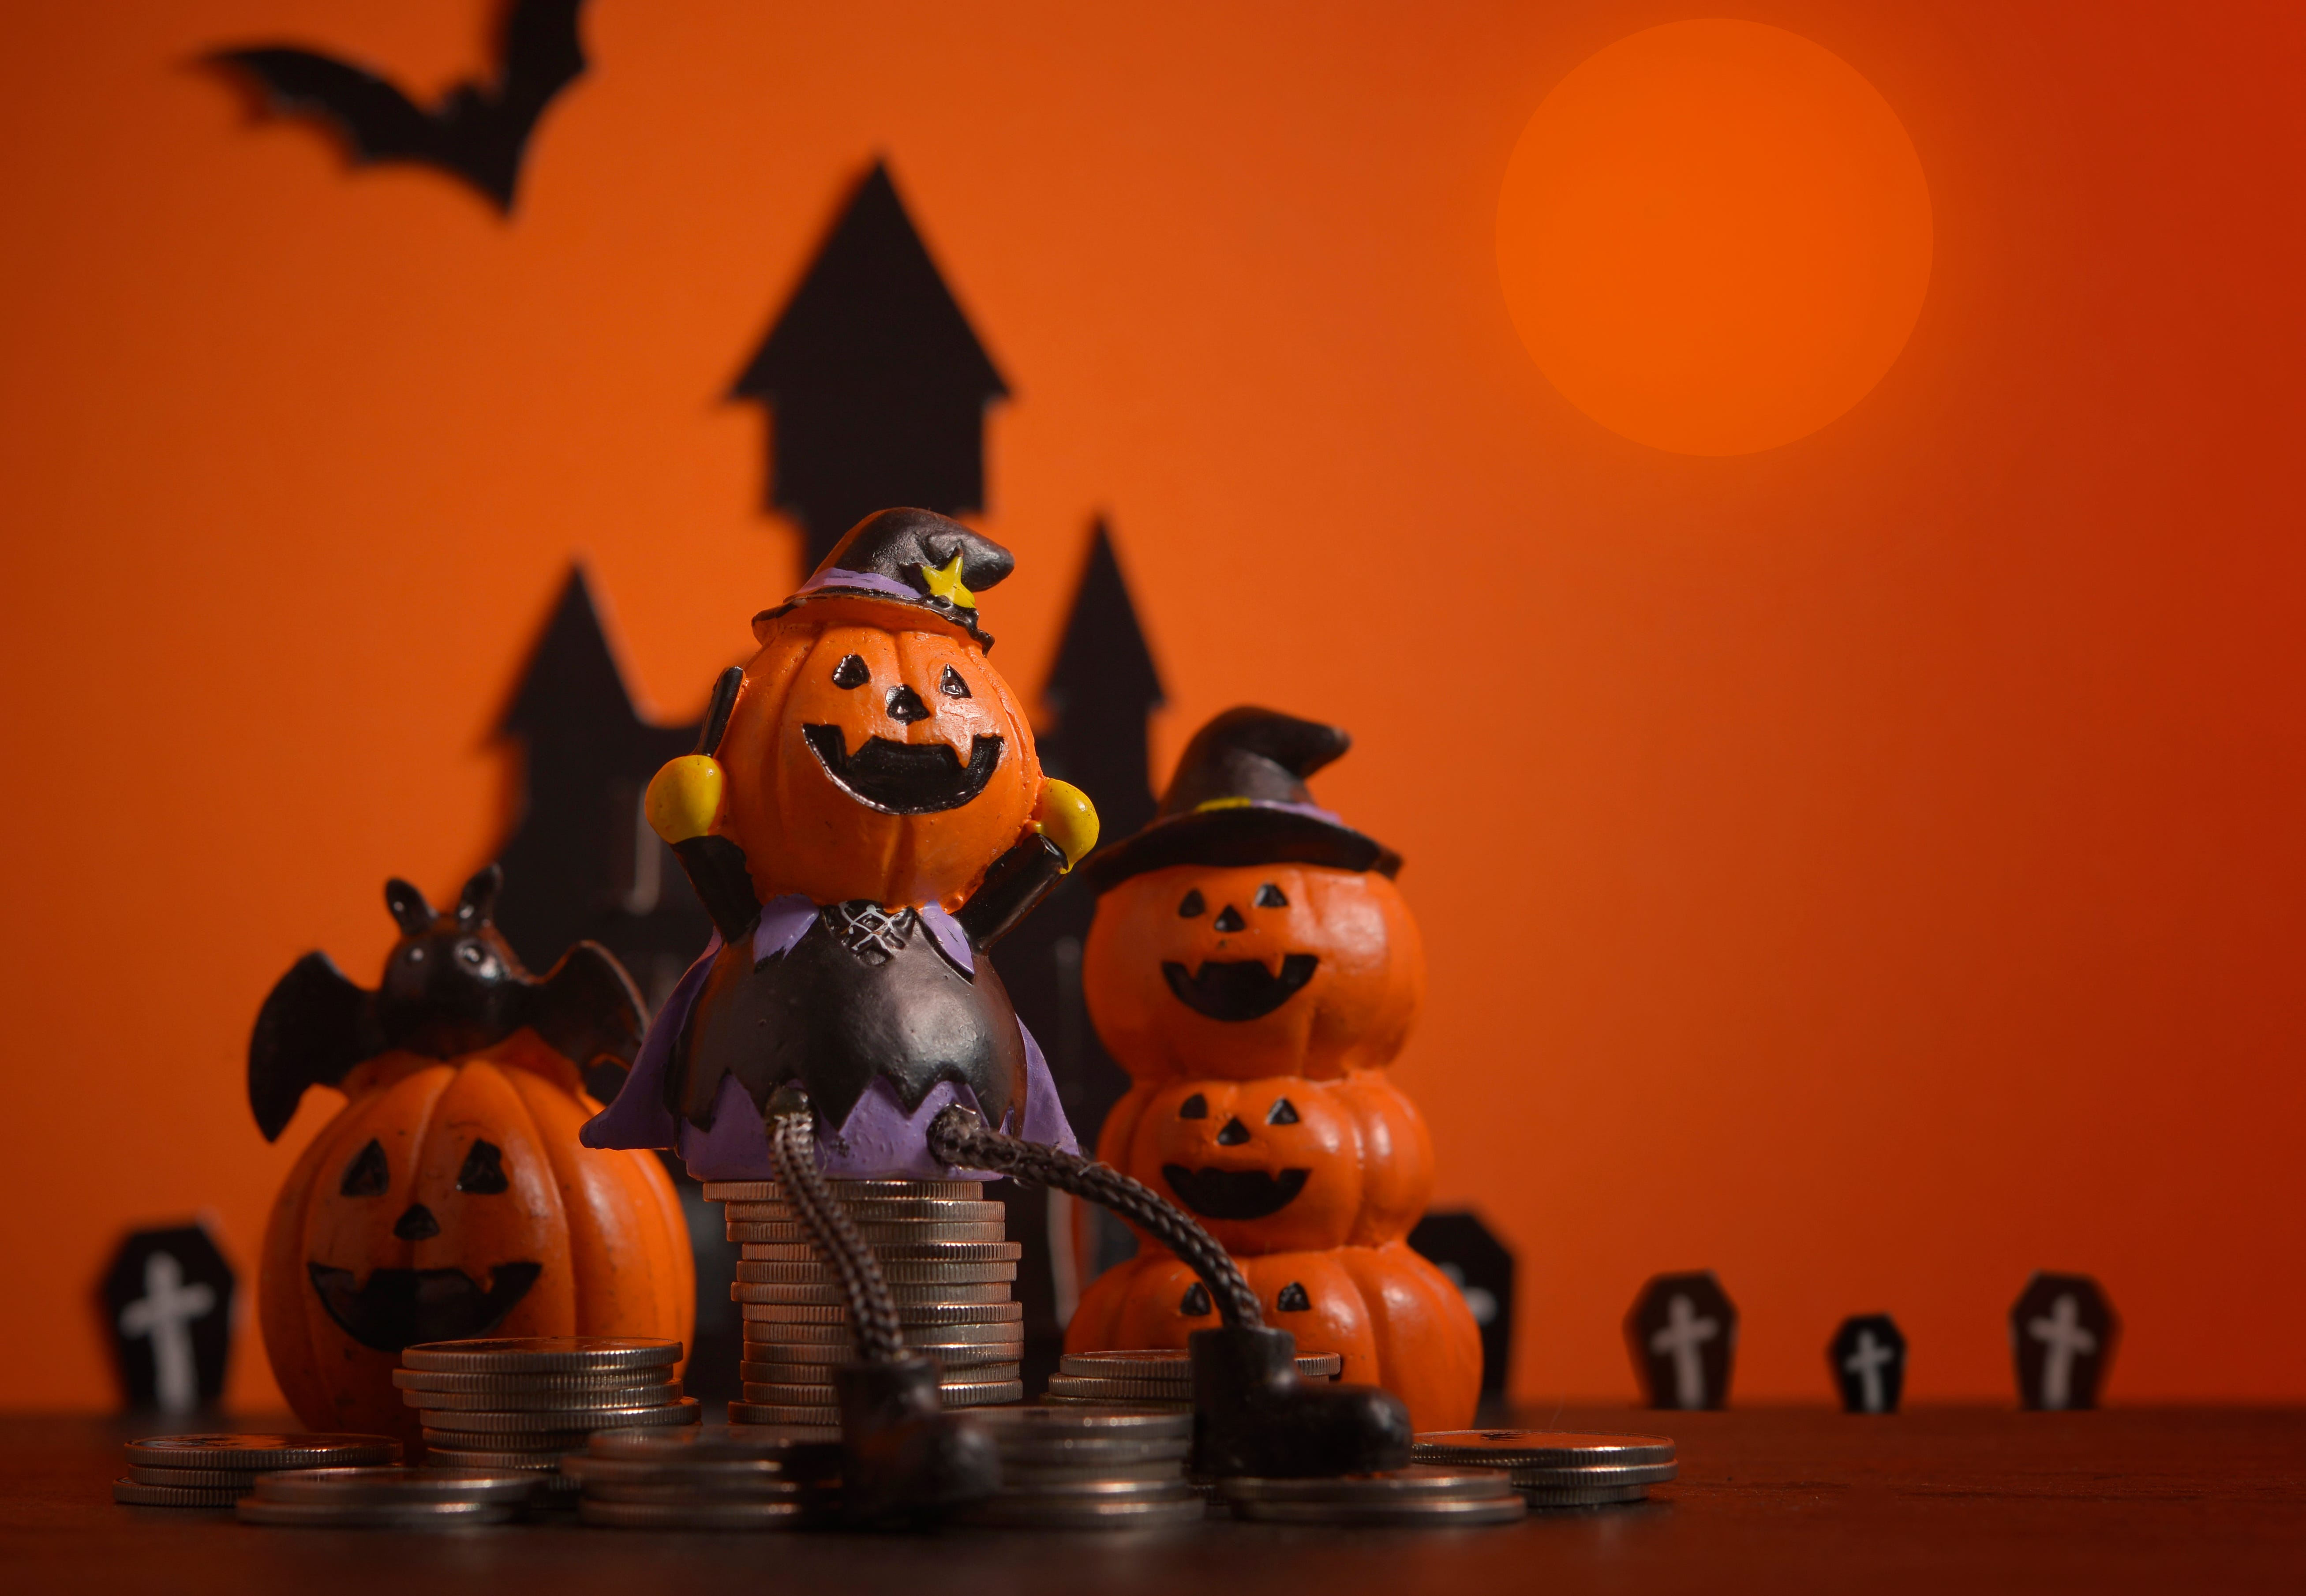 Halloween Pumpkins Jack O Lantern On Orange Background Halloween Pumpkin Background Halloween Jack O Lantern Halloween Jack O Lantern Happy Halloween